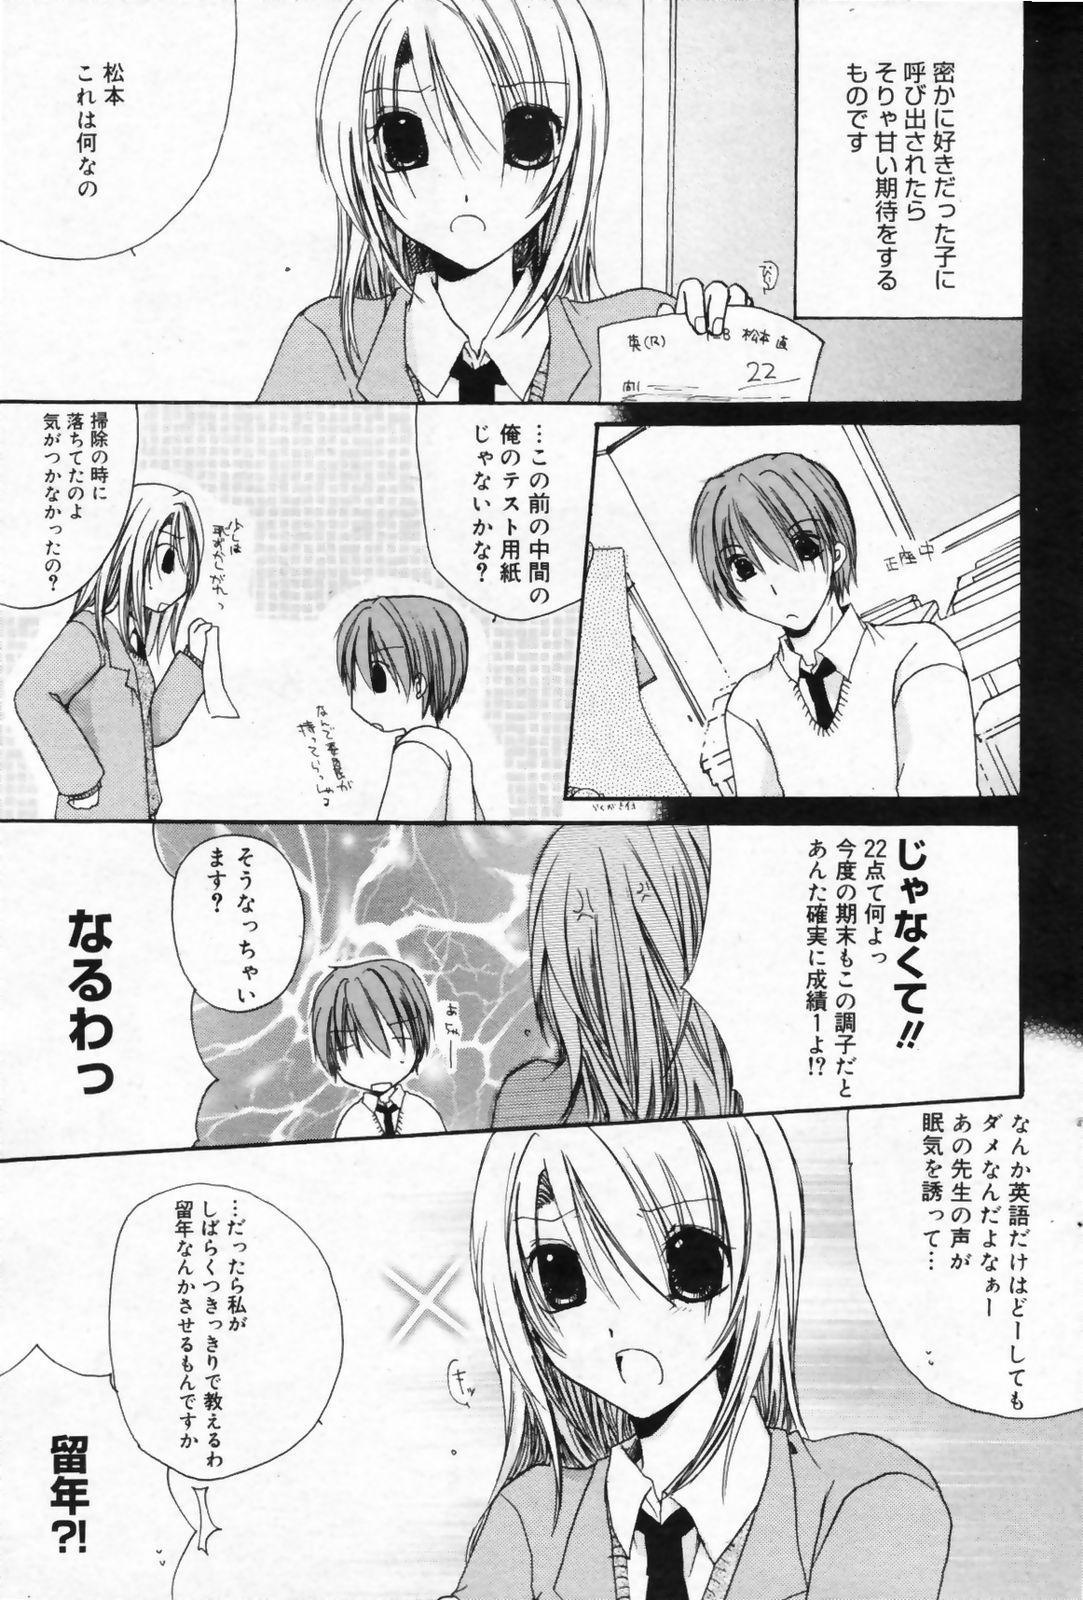 Manga Bangaichi 2009-02 Vol. 234 100